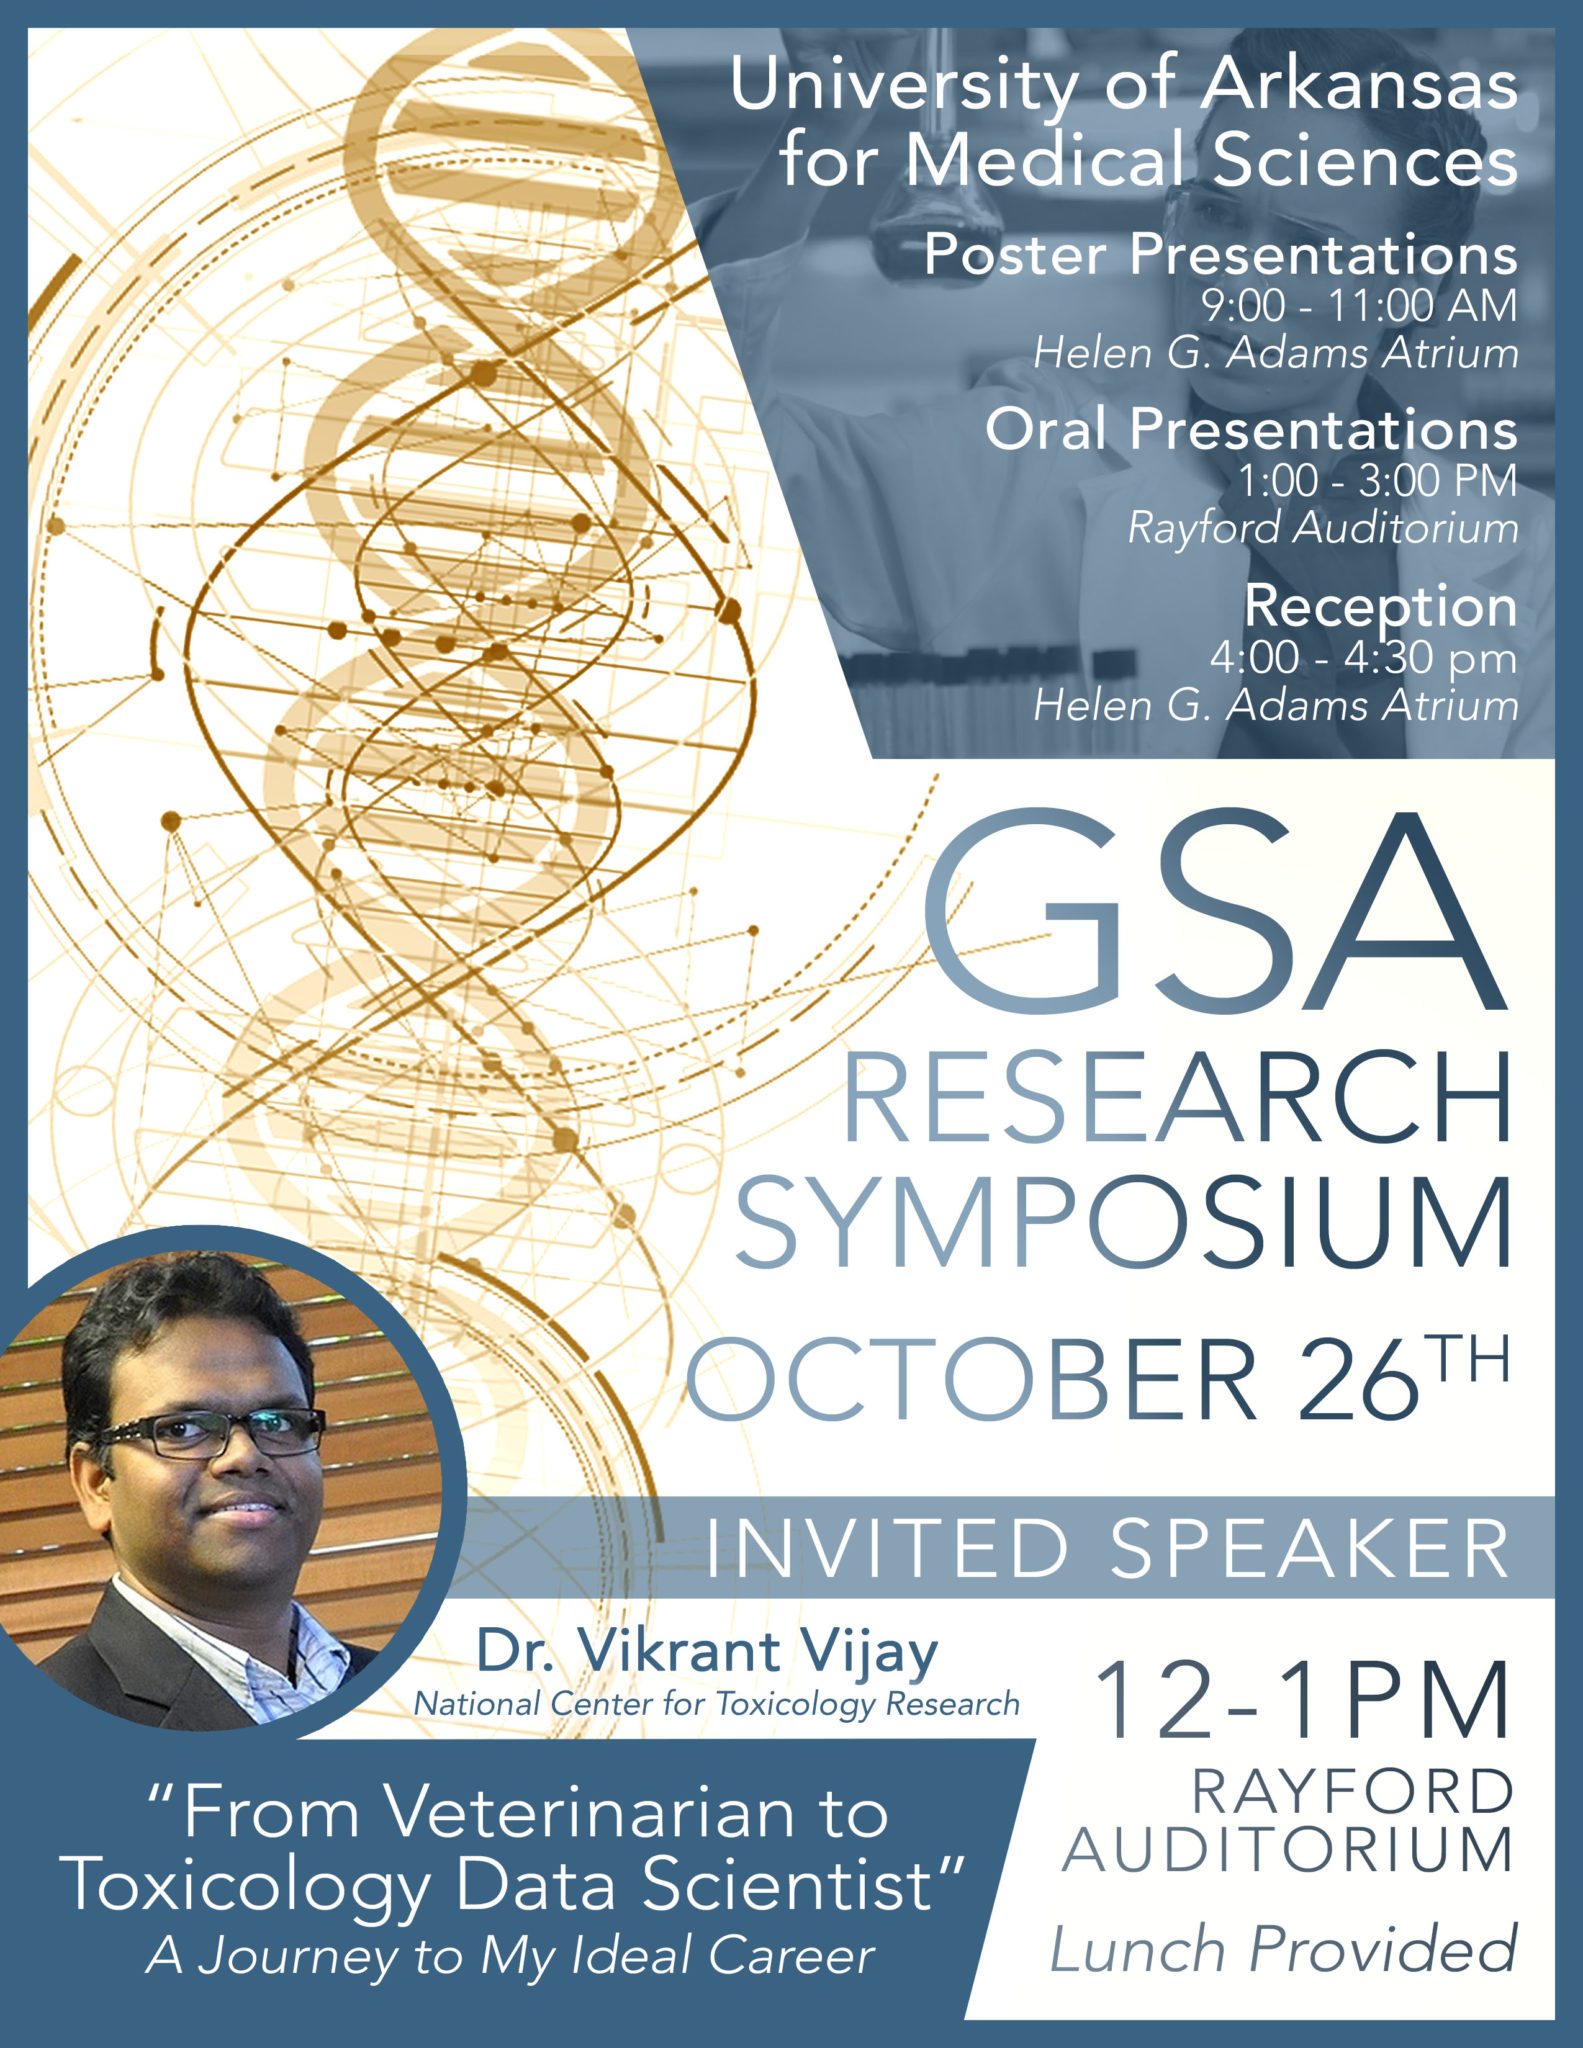 gsa symposium flyer